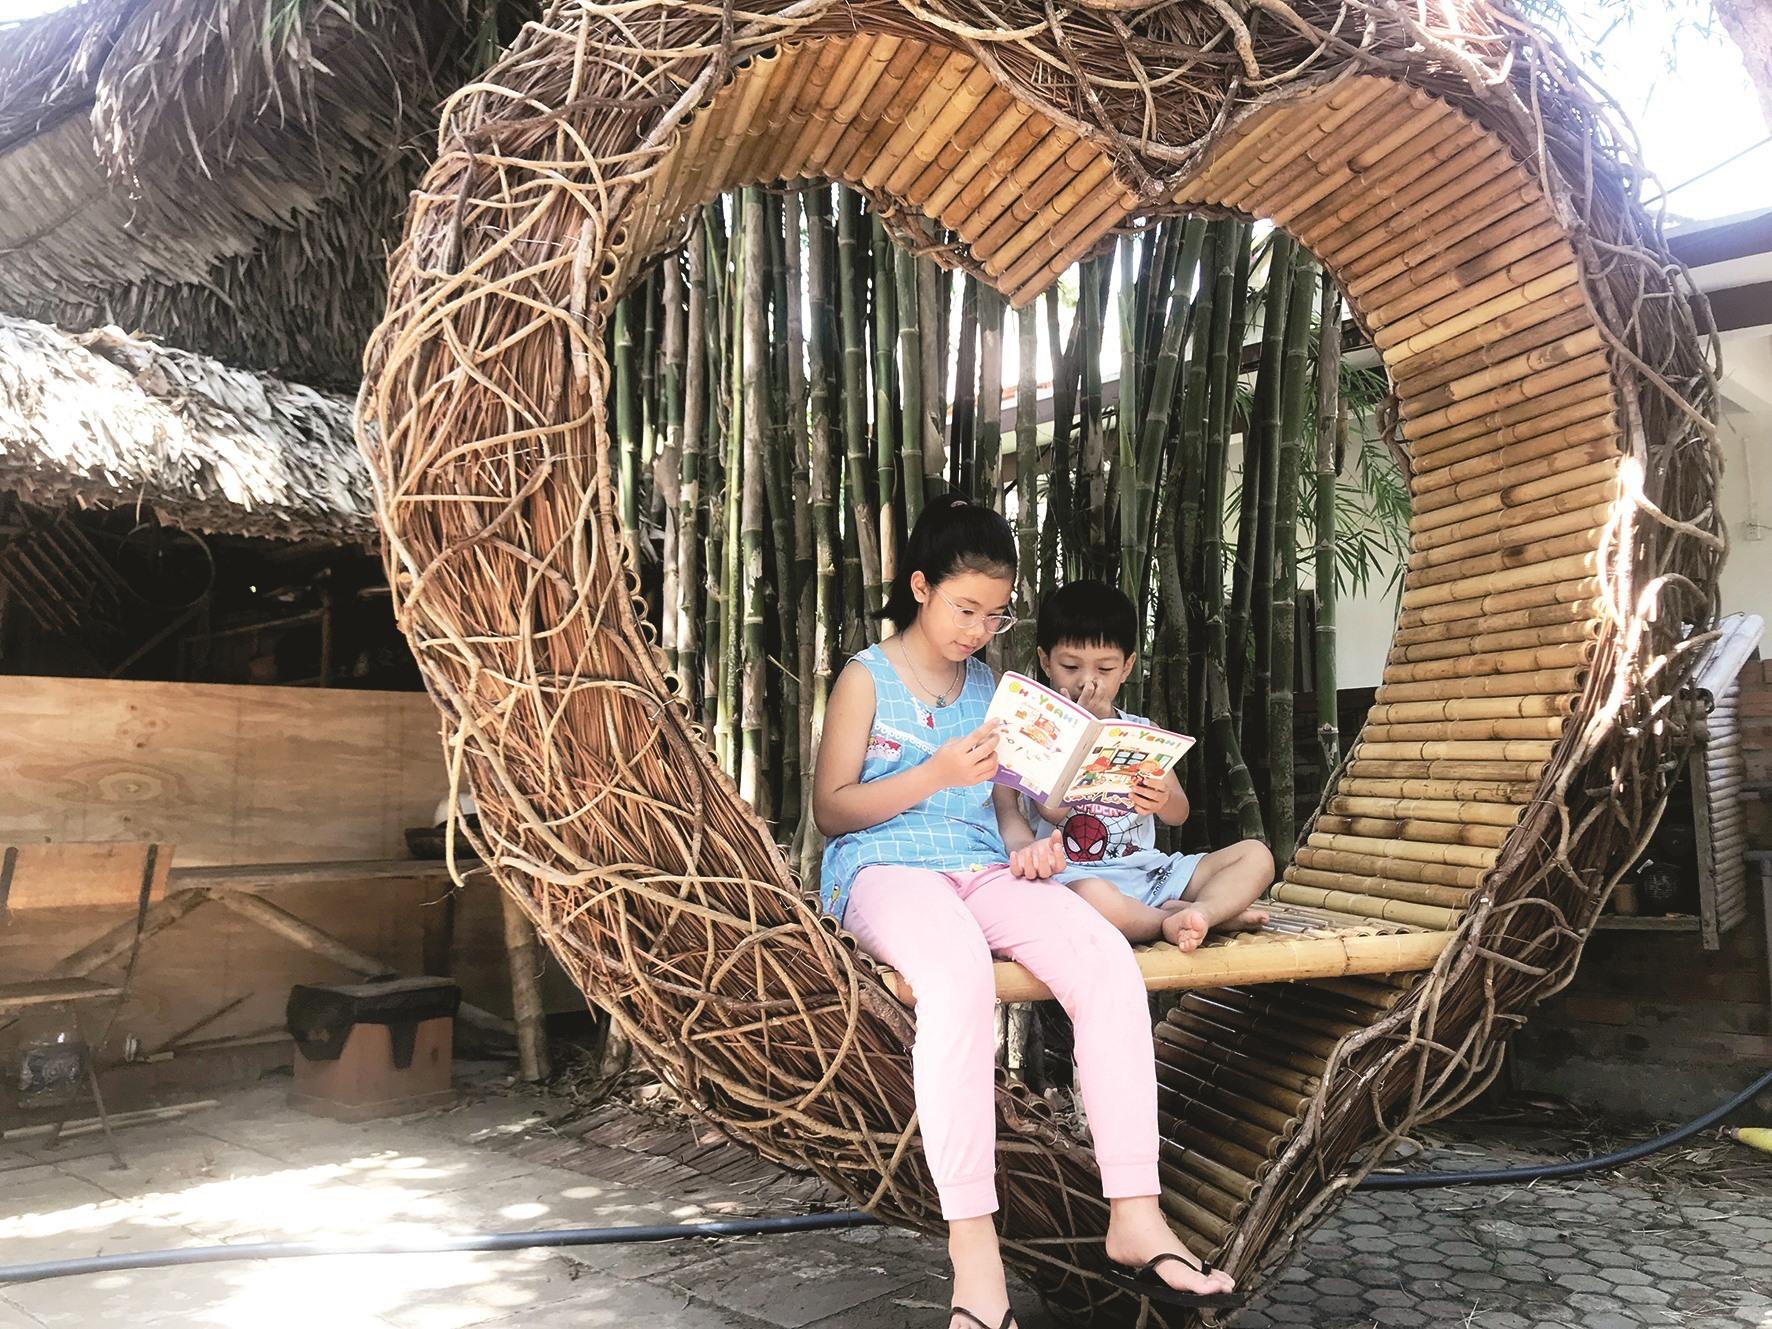 A heart-shaped bamboo and nipa palm product